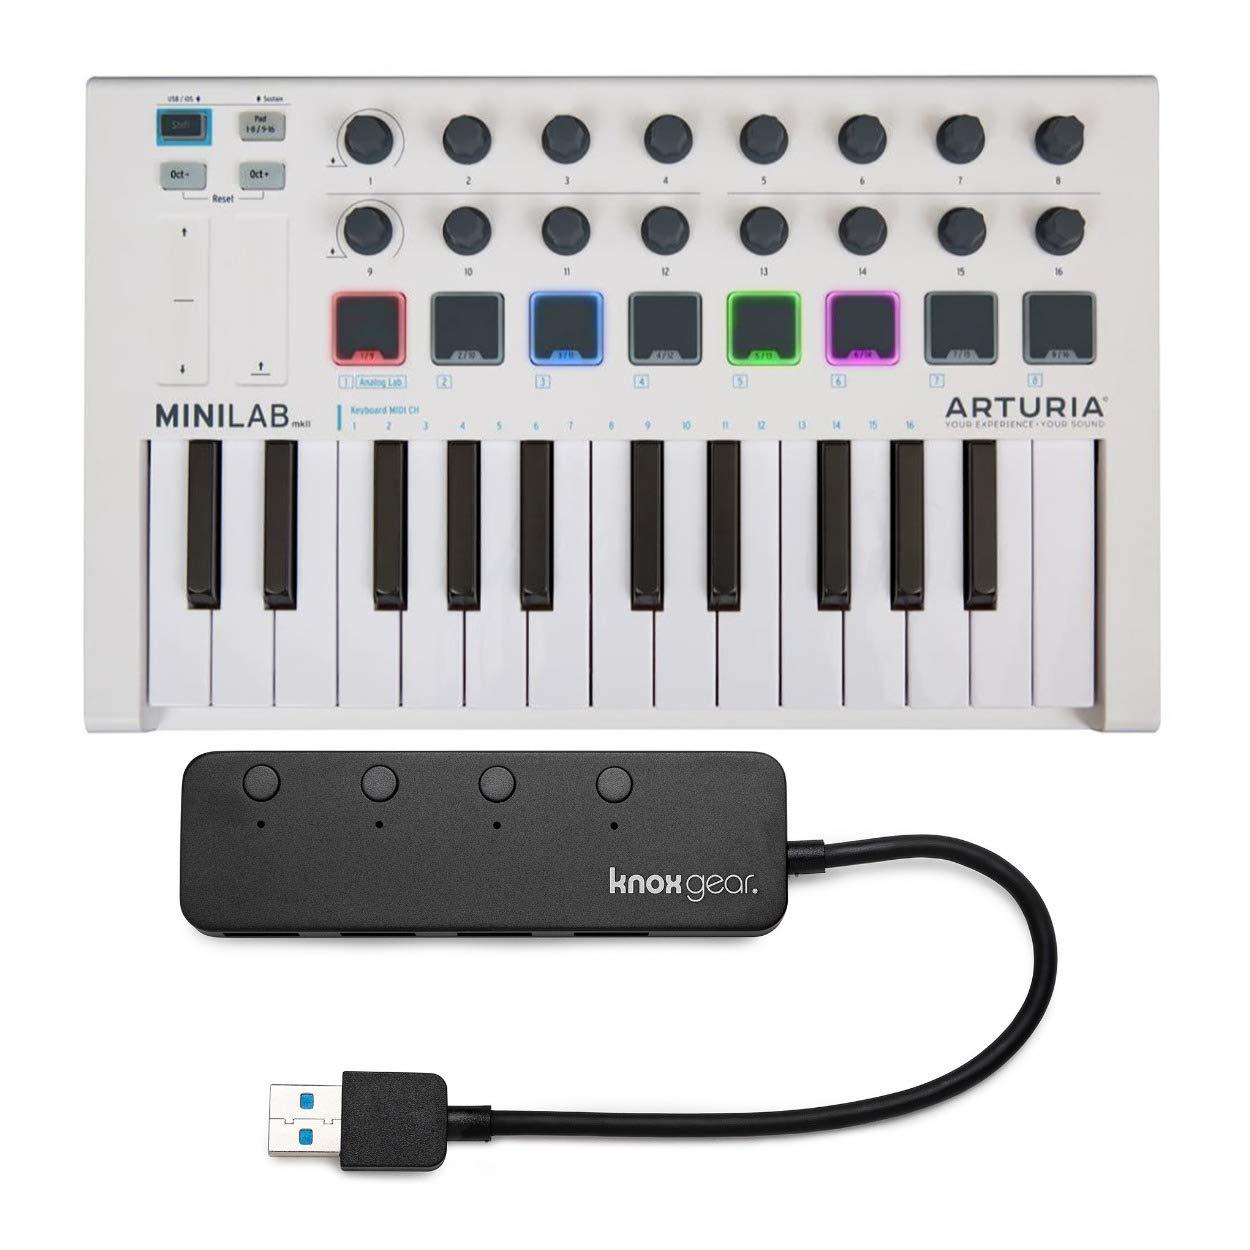 Arturia MiniLab MkII 25 Slim-Key Controller with Knox 3.0 4 Port USB HUB by Arturia